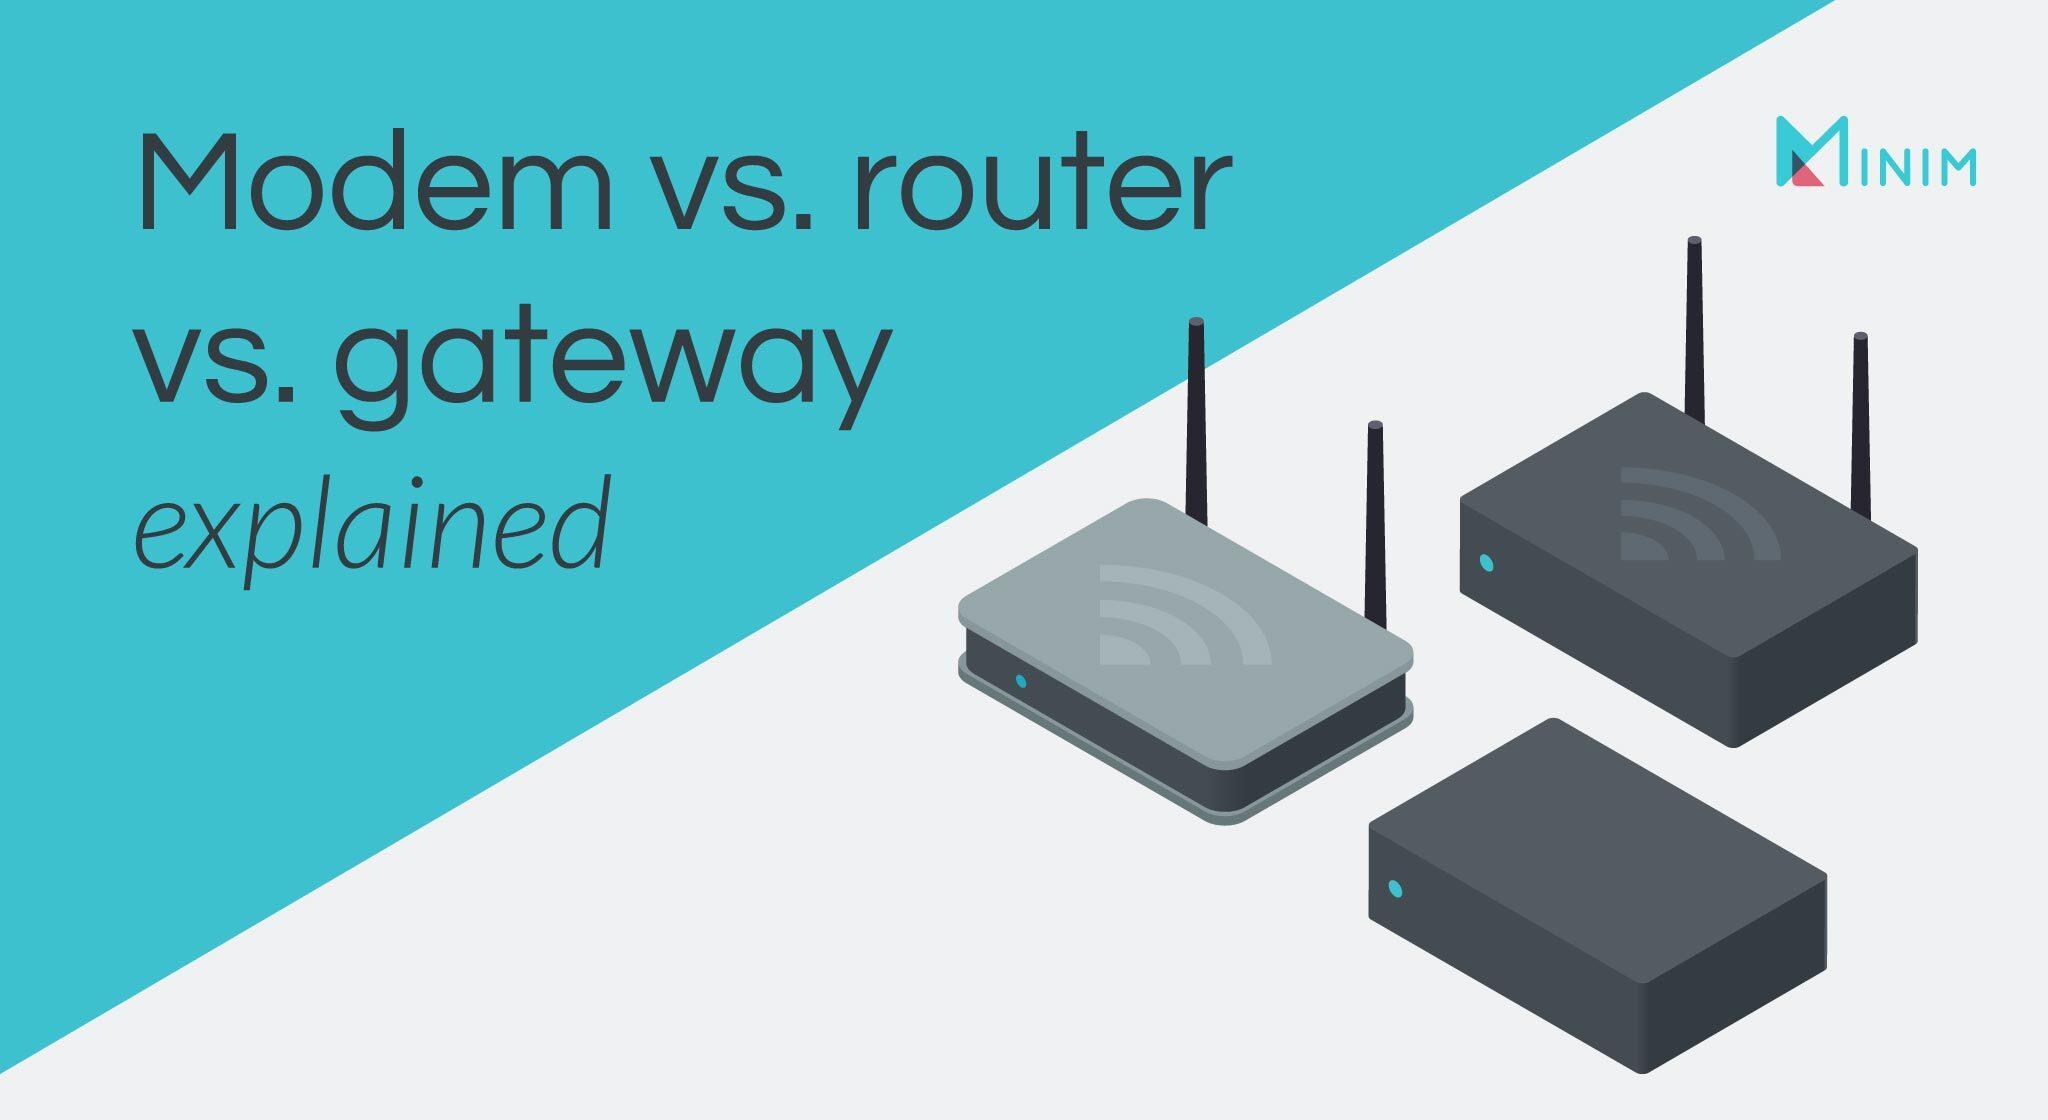 Modem vs Router vs Gateway